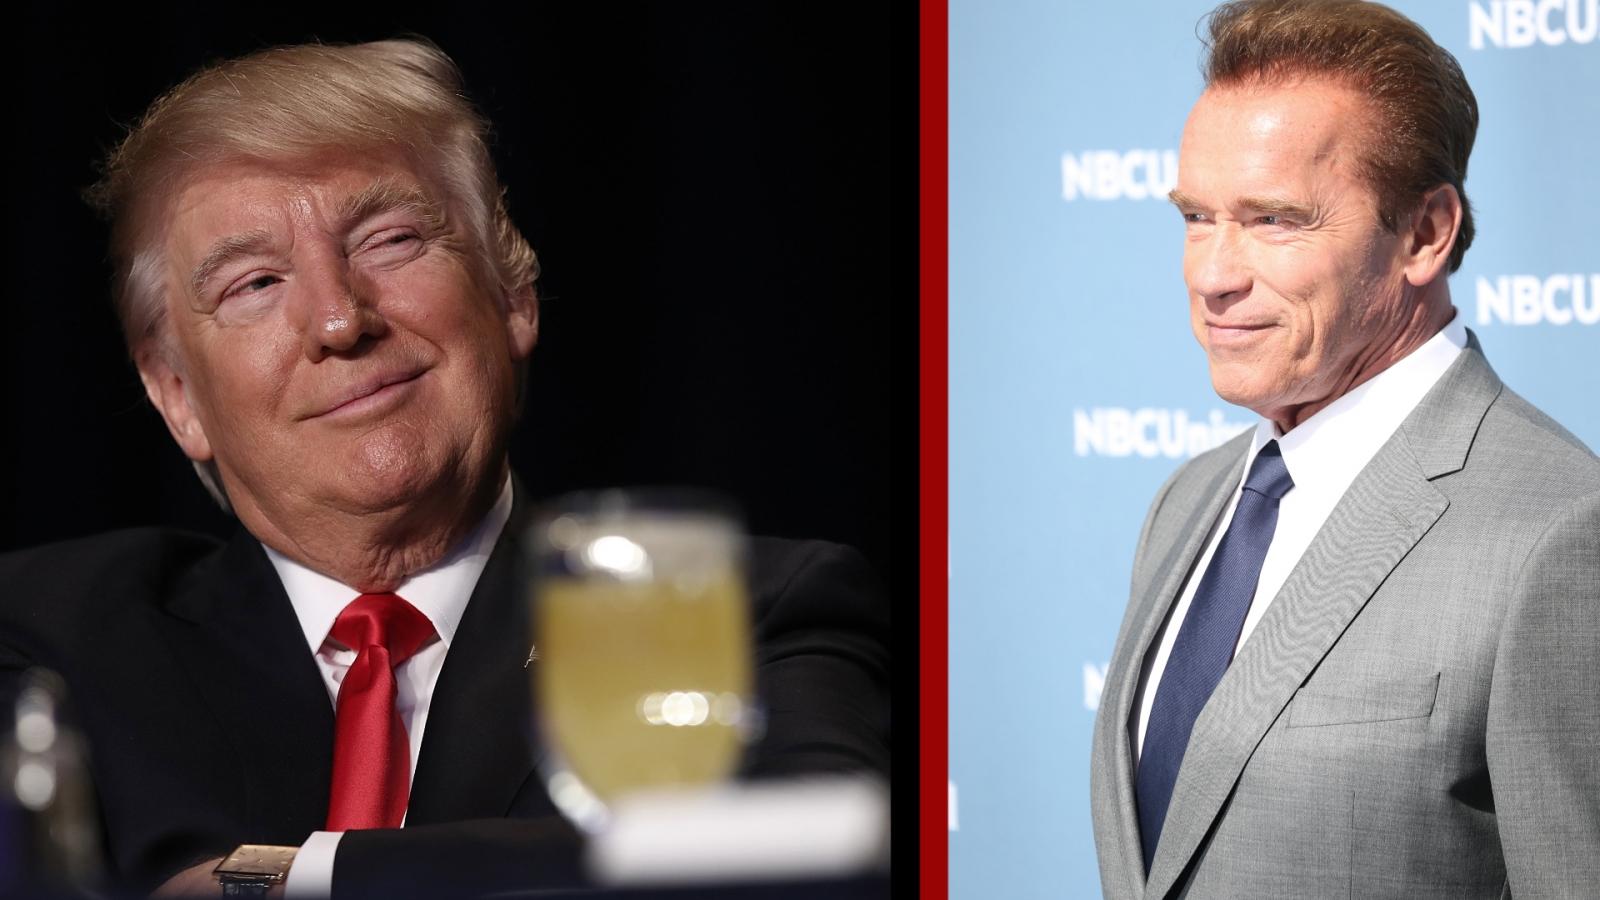 Arnold Schwarzenegger and Donald Trump